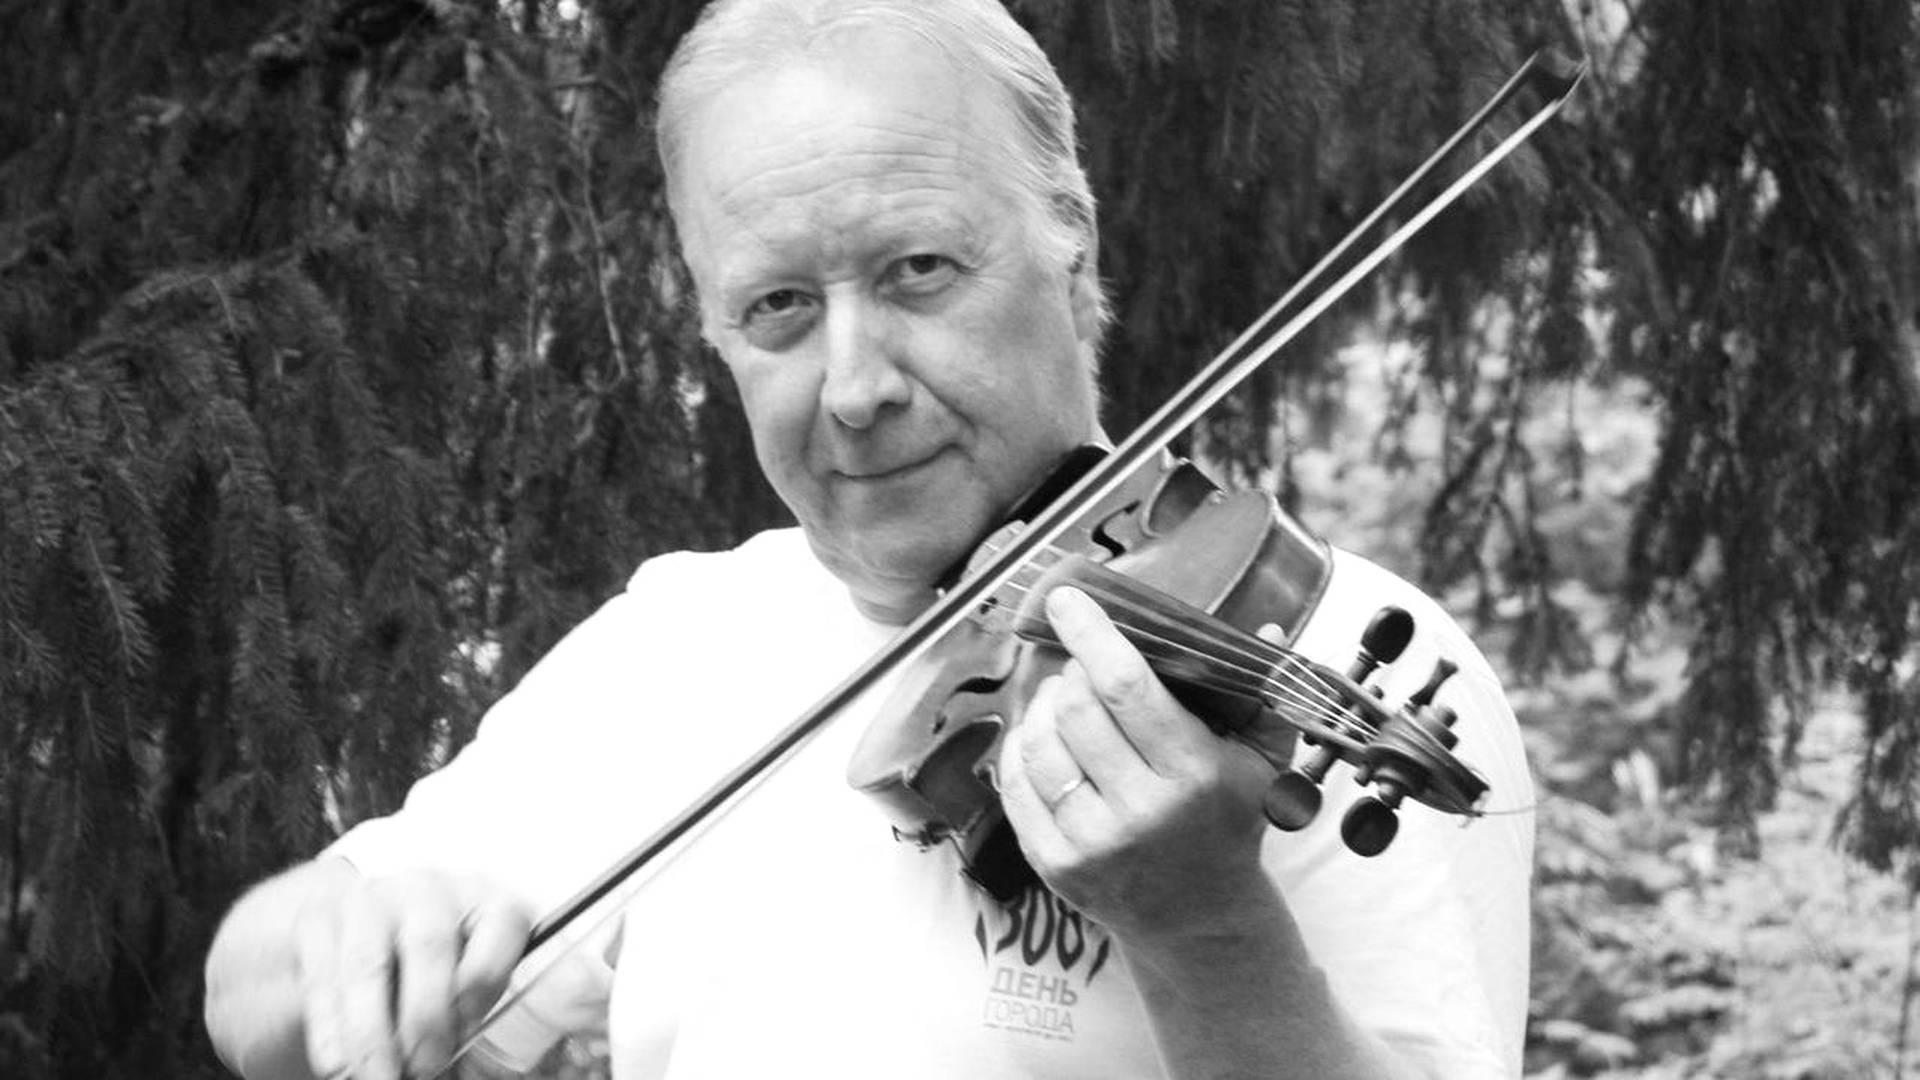 Antero Makkonen